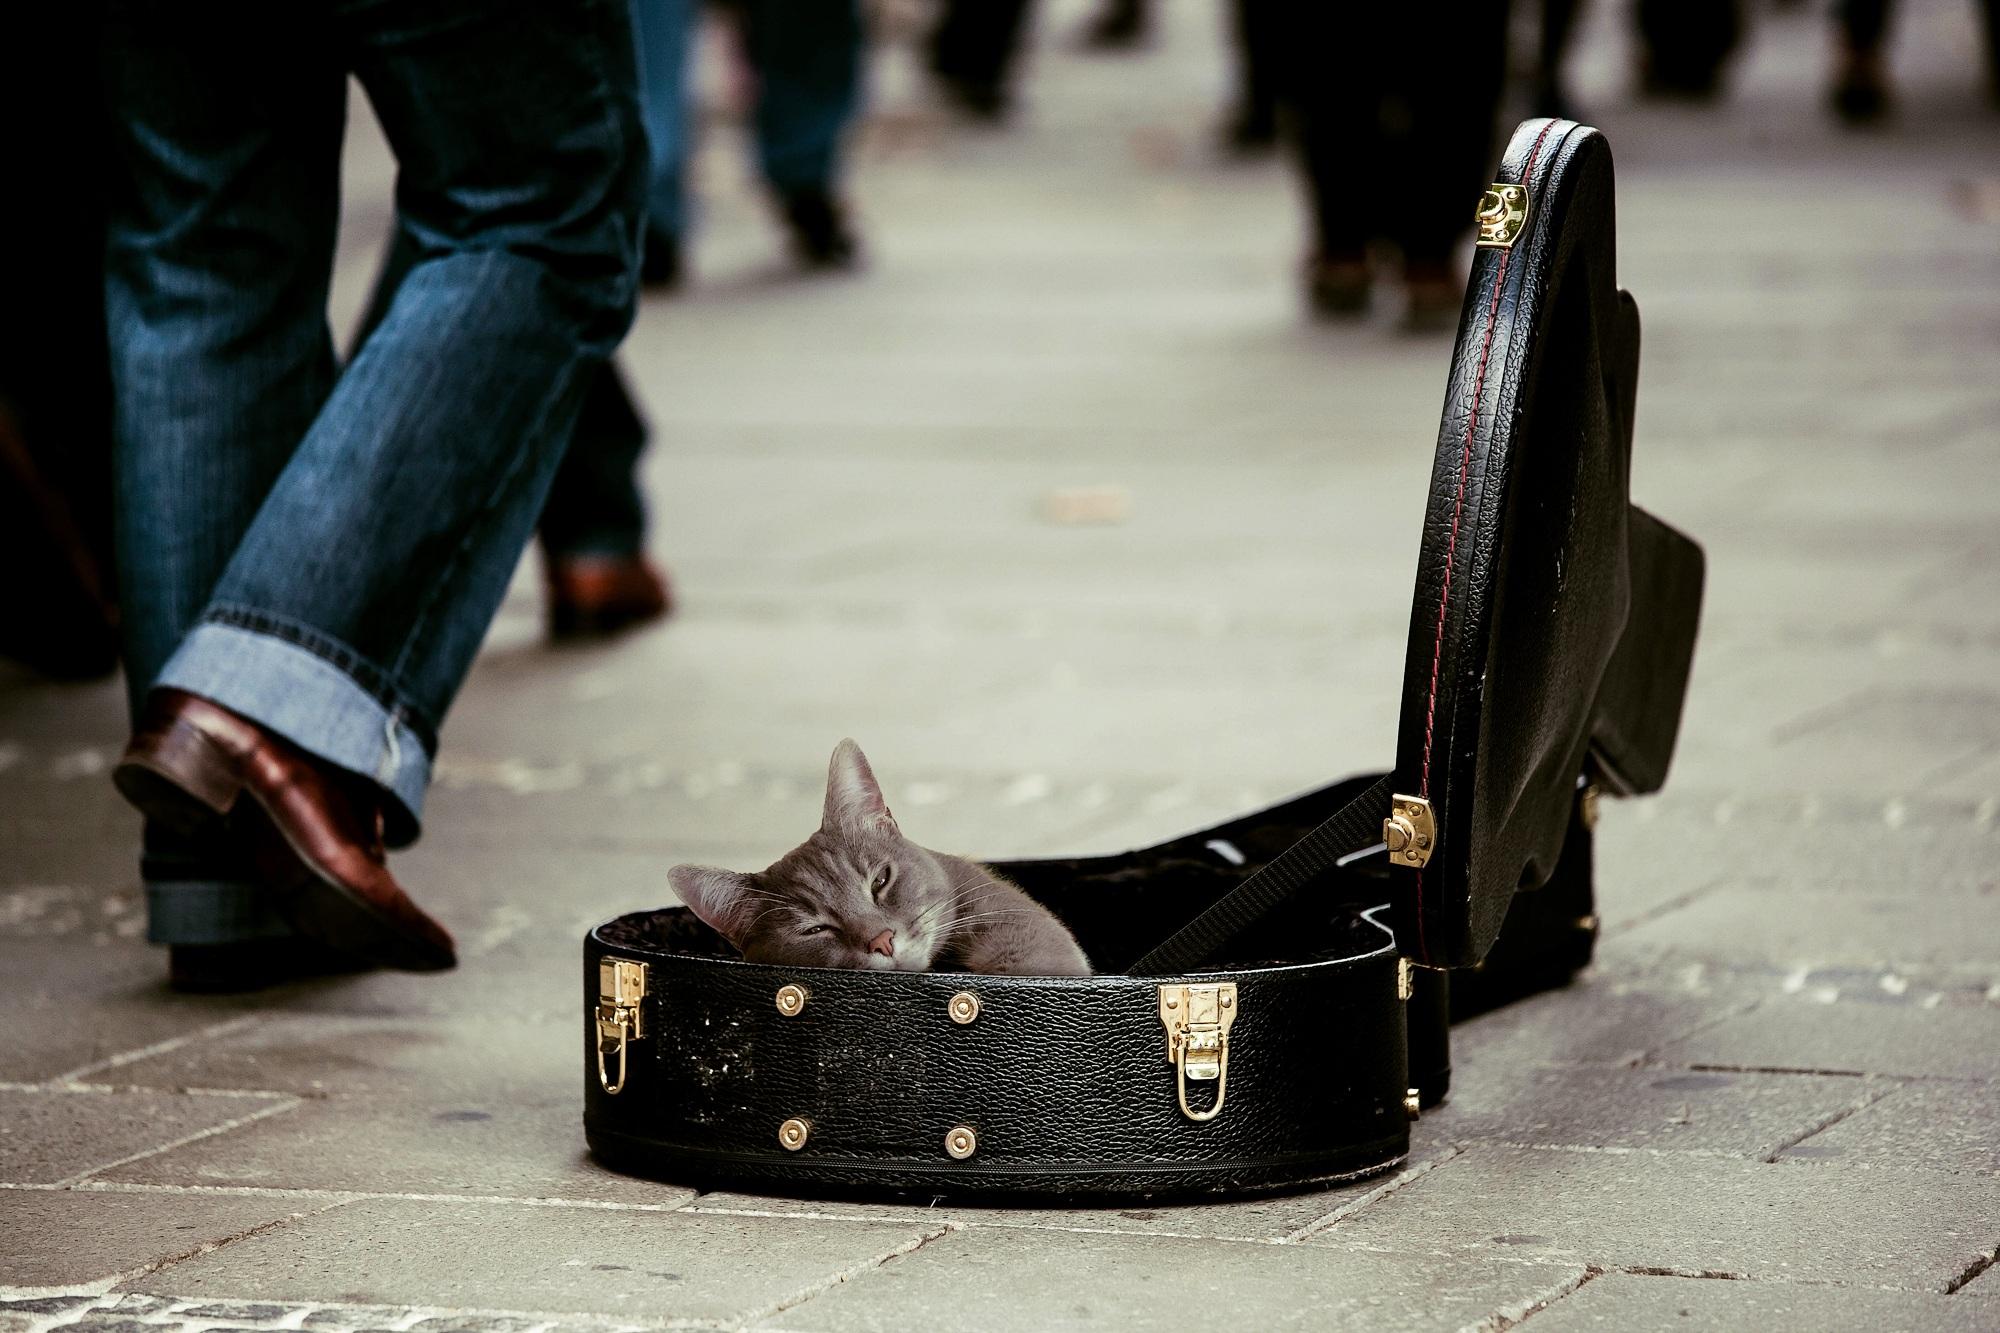 Cat in guitar